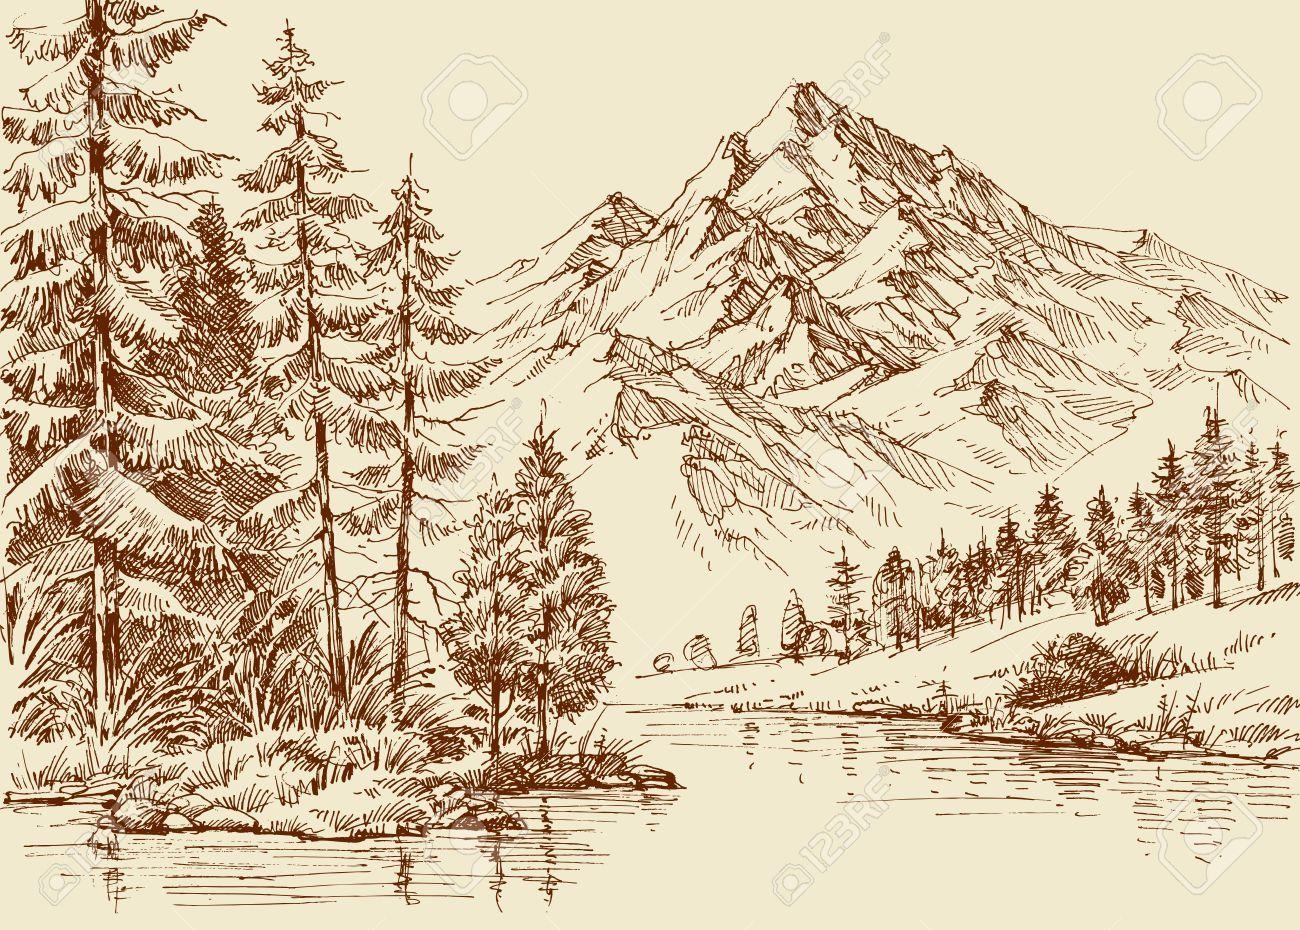 Alpine Landscape River And Pine Forest Sketch Forest Sketch Landscape Drawings Landscape Sketch